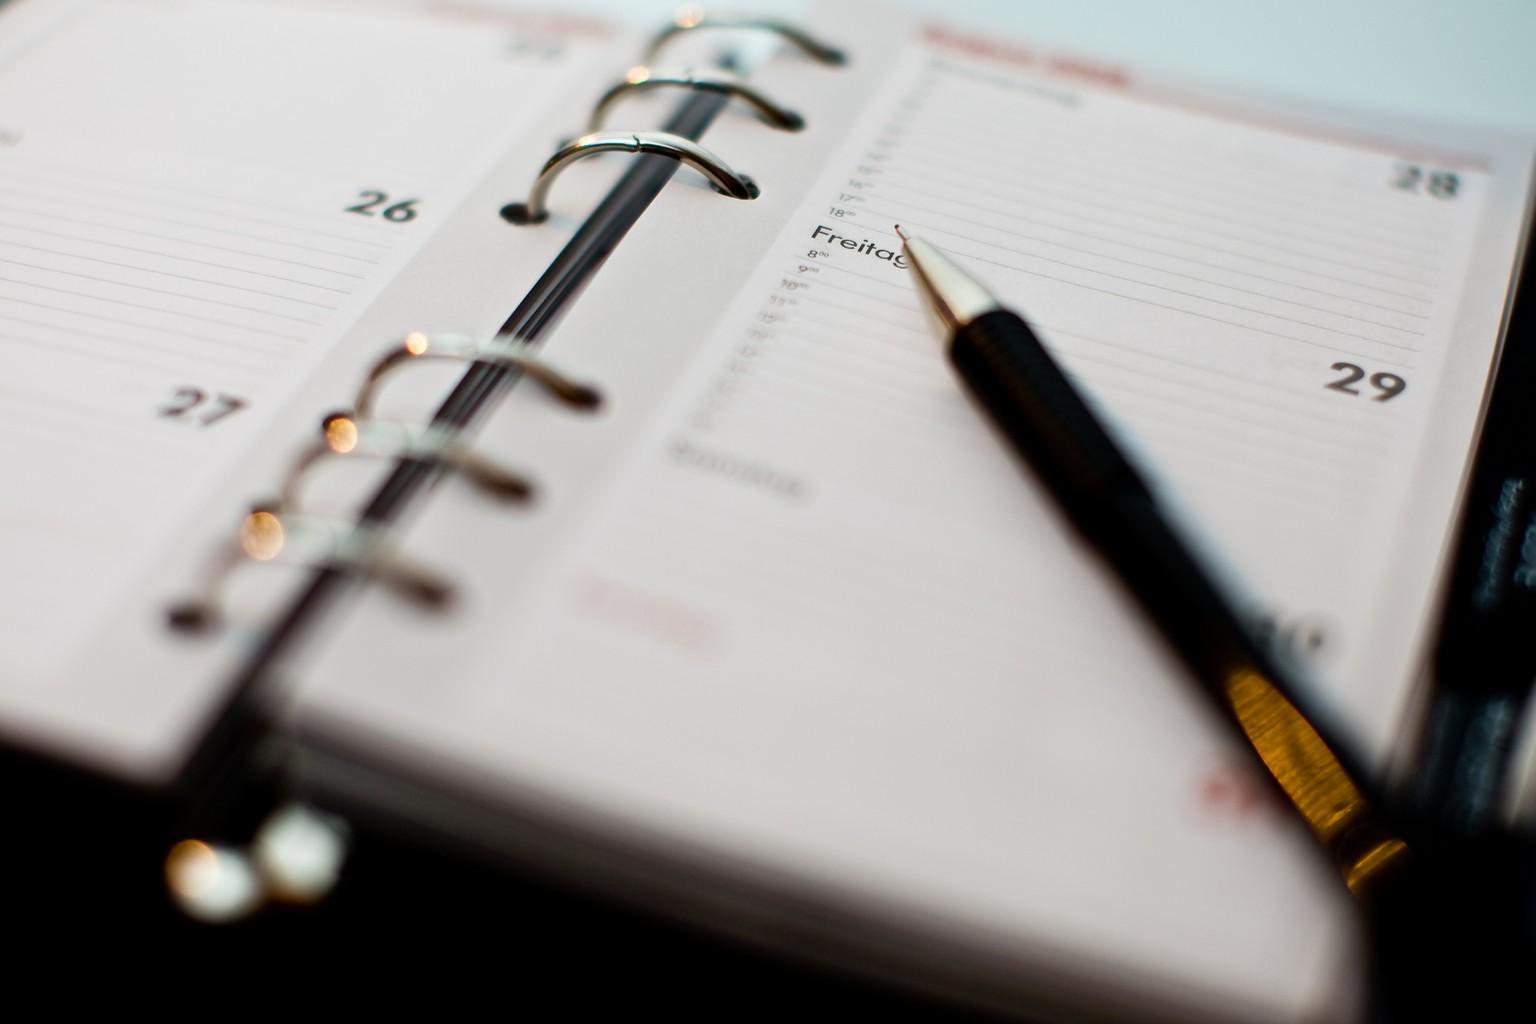 Agenda © Pixabay